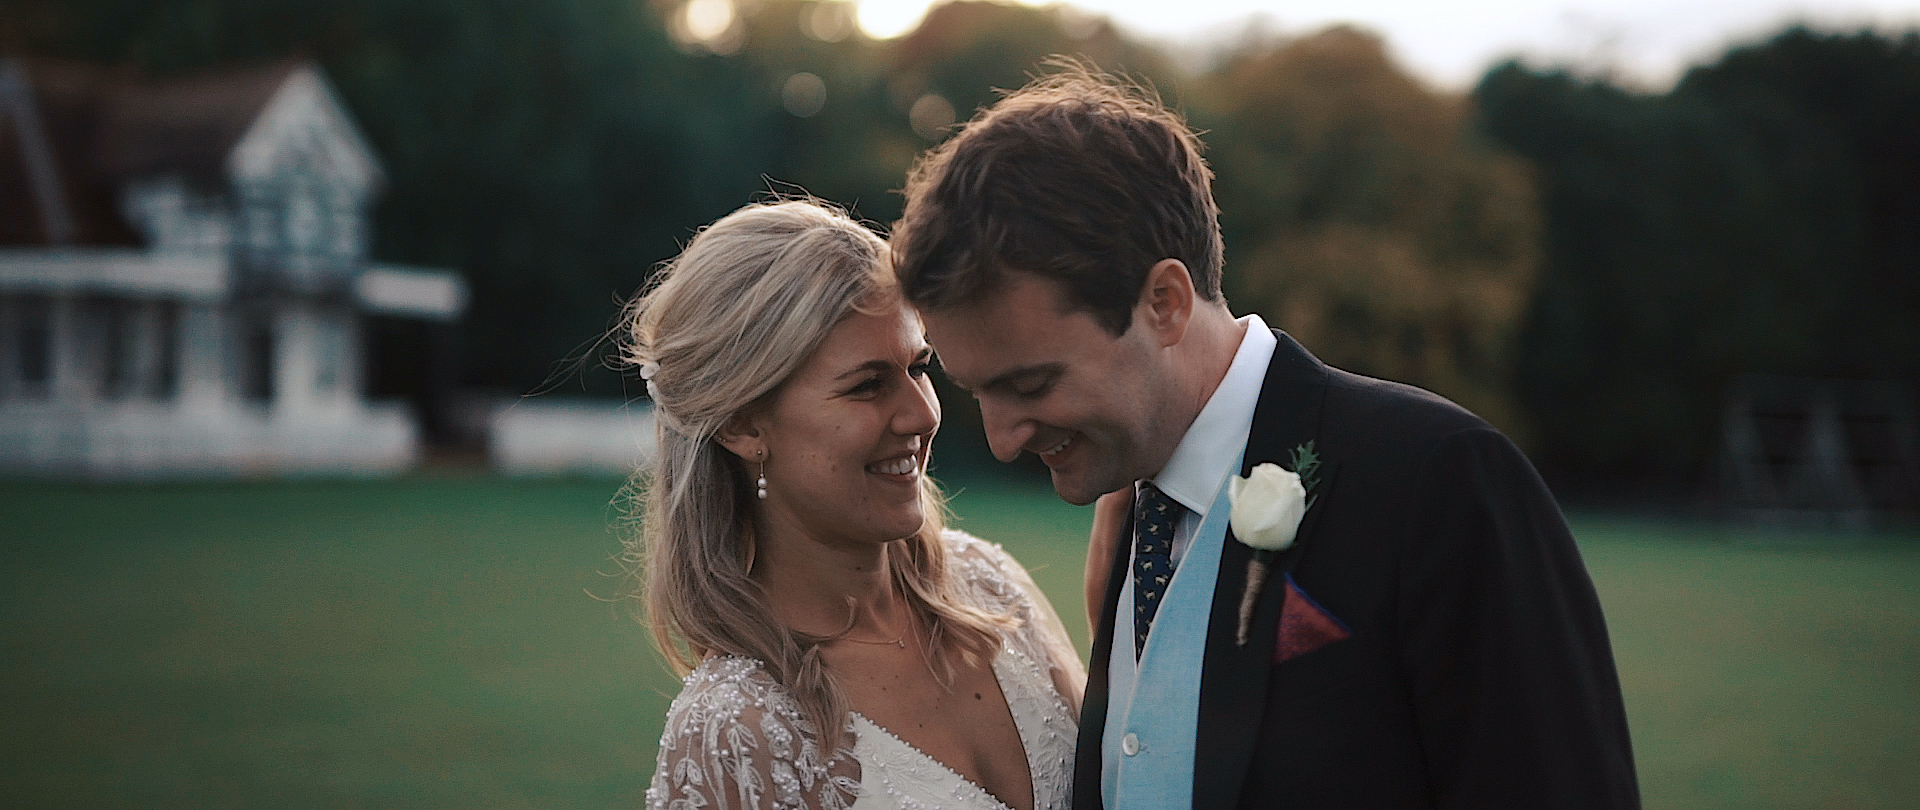 Stamford Wedding Video - Philip Smith Visuals